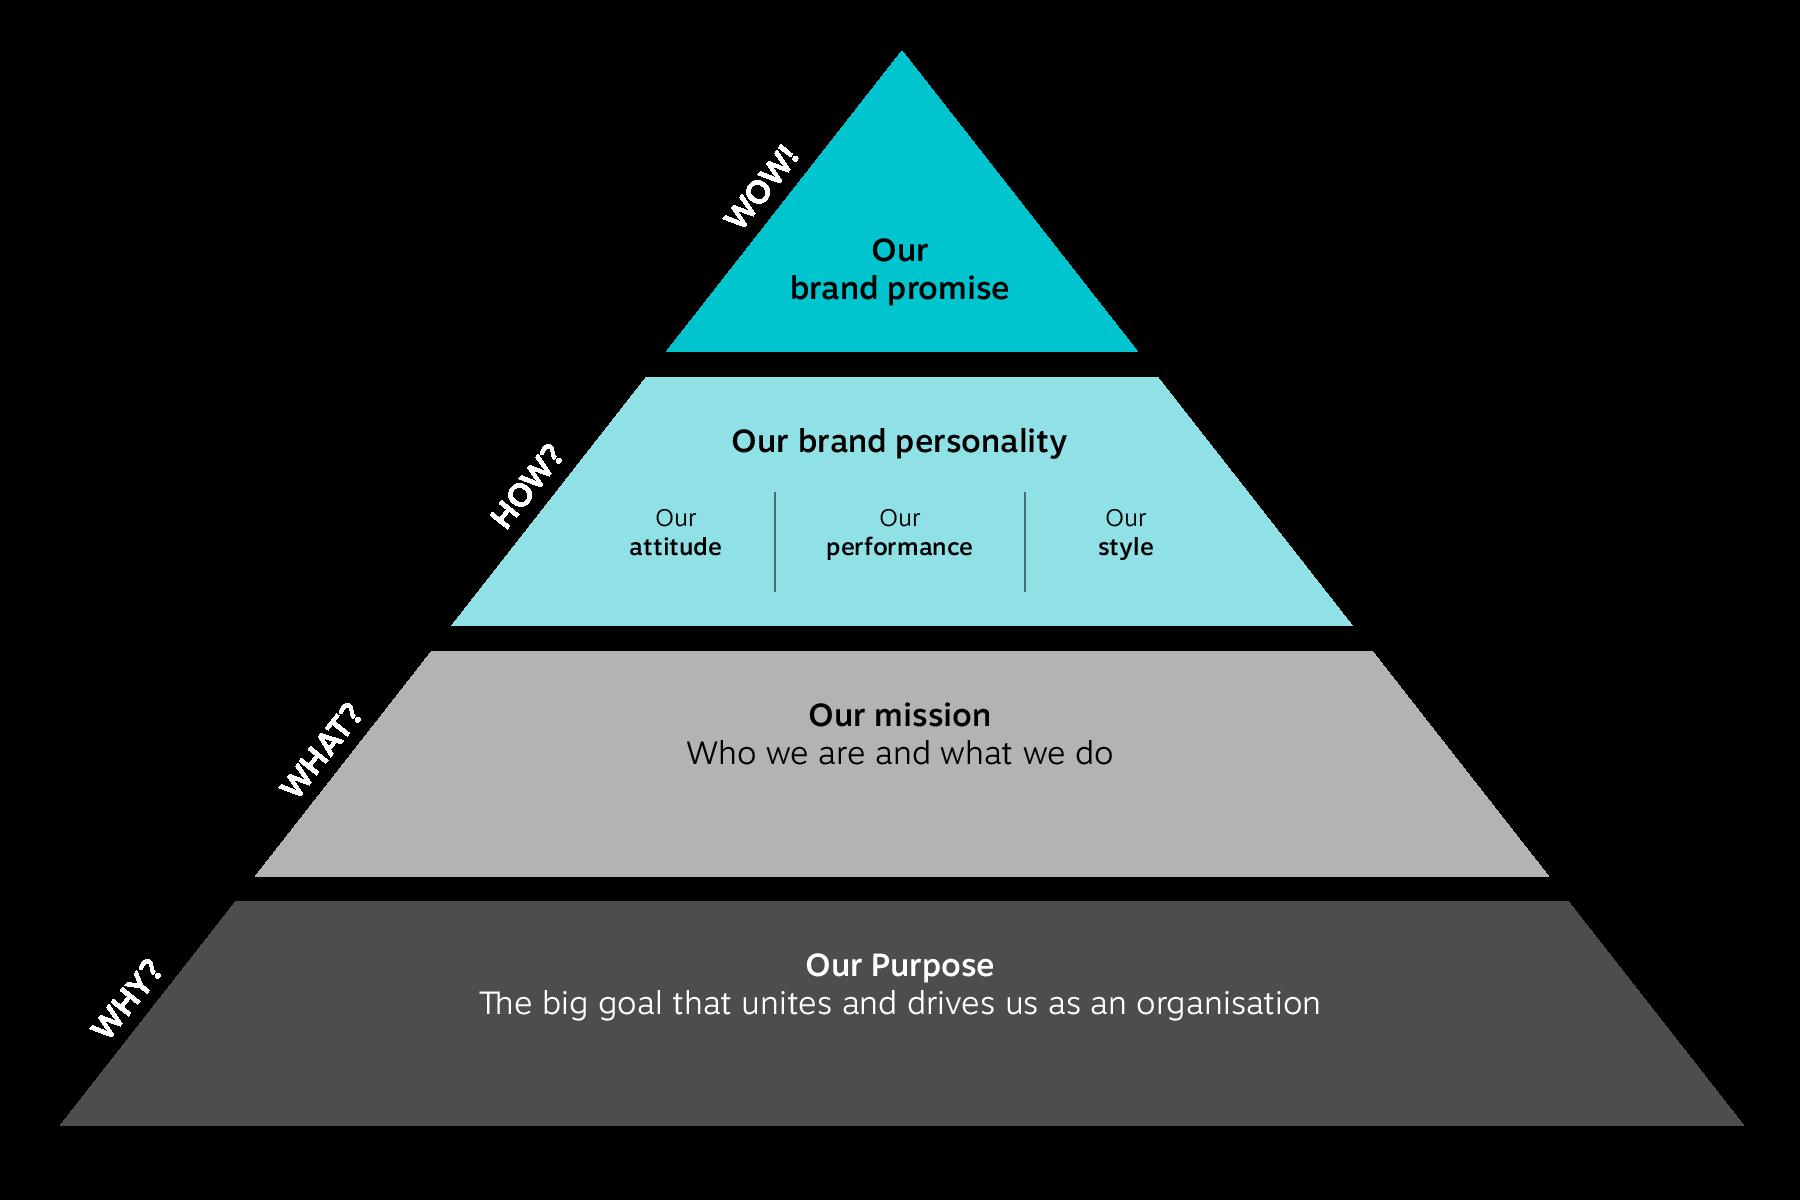 brandsformation_identity-pyramid